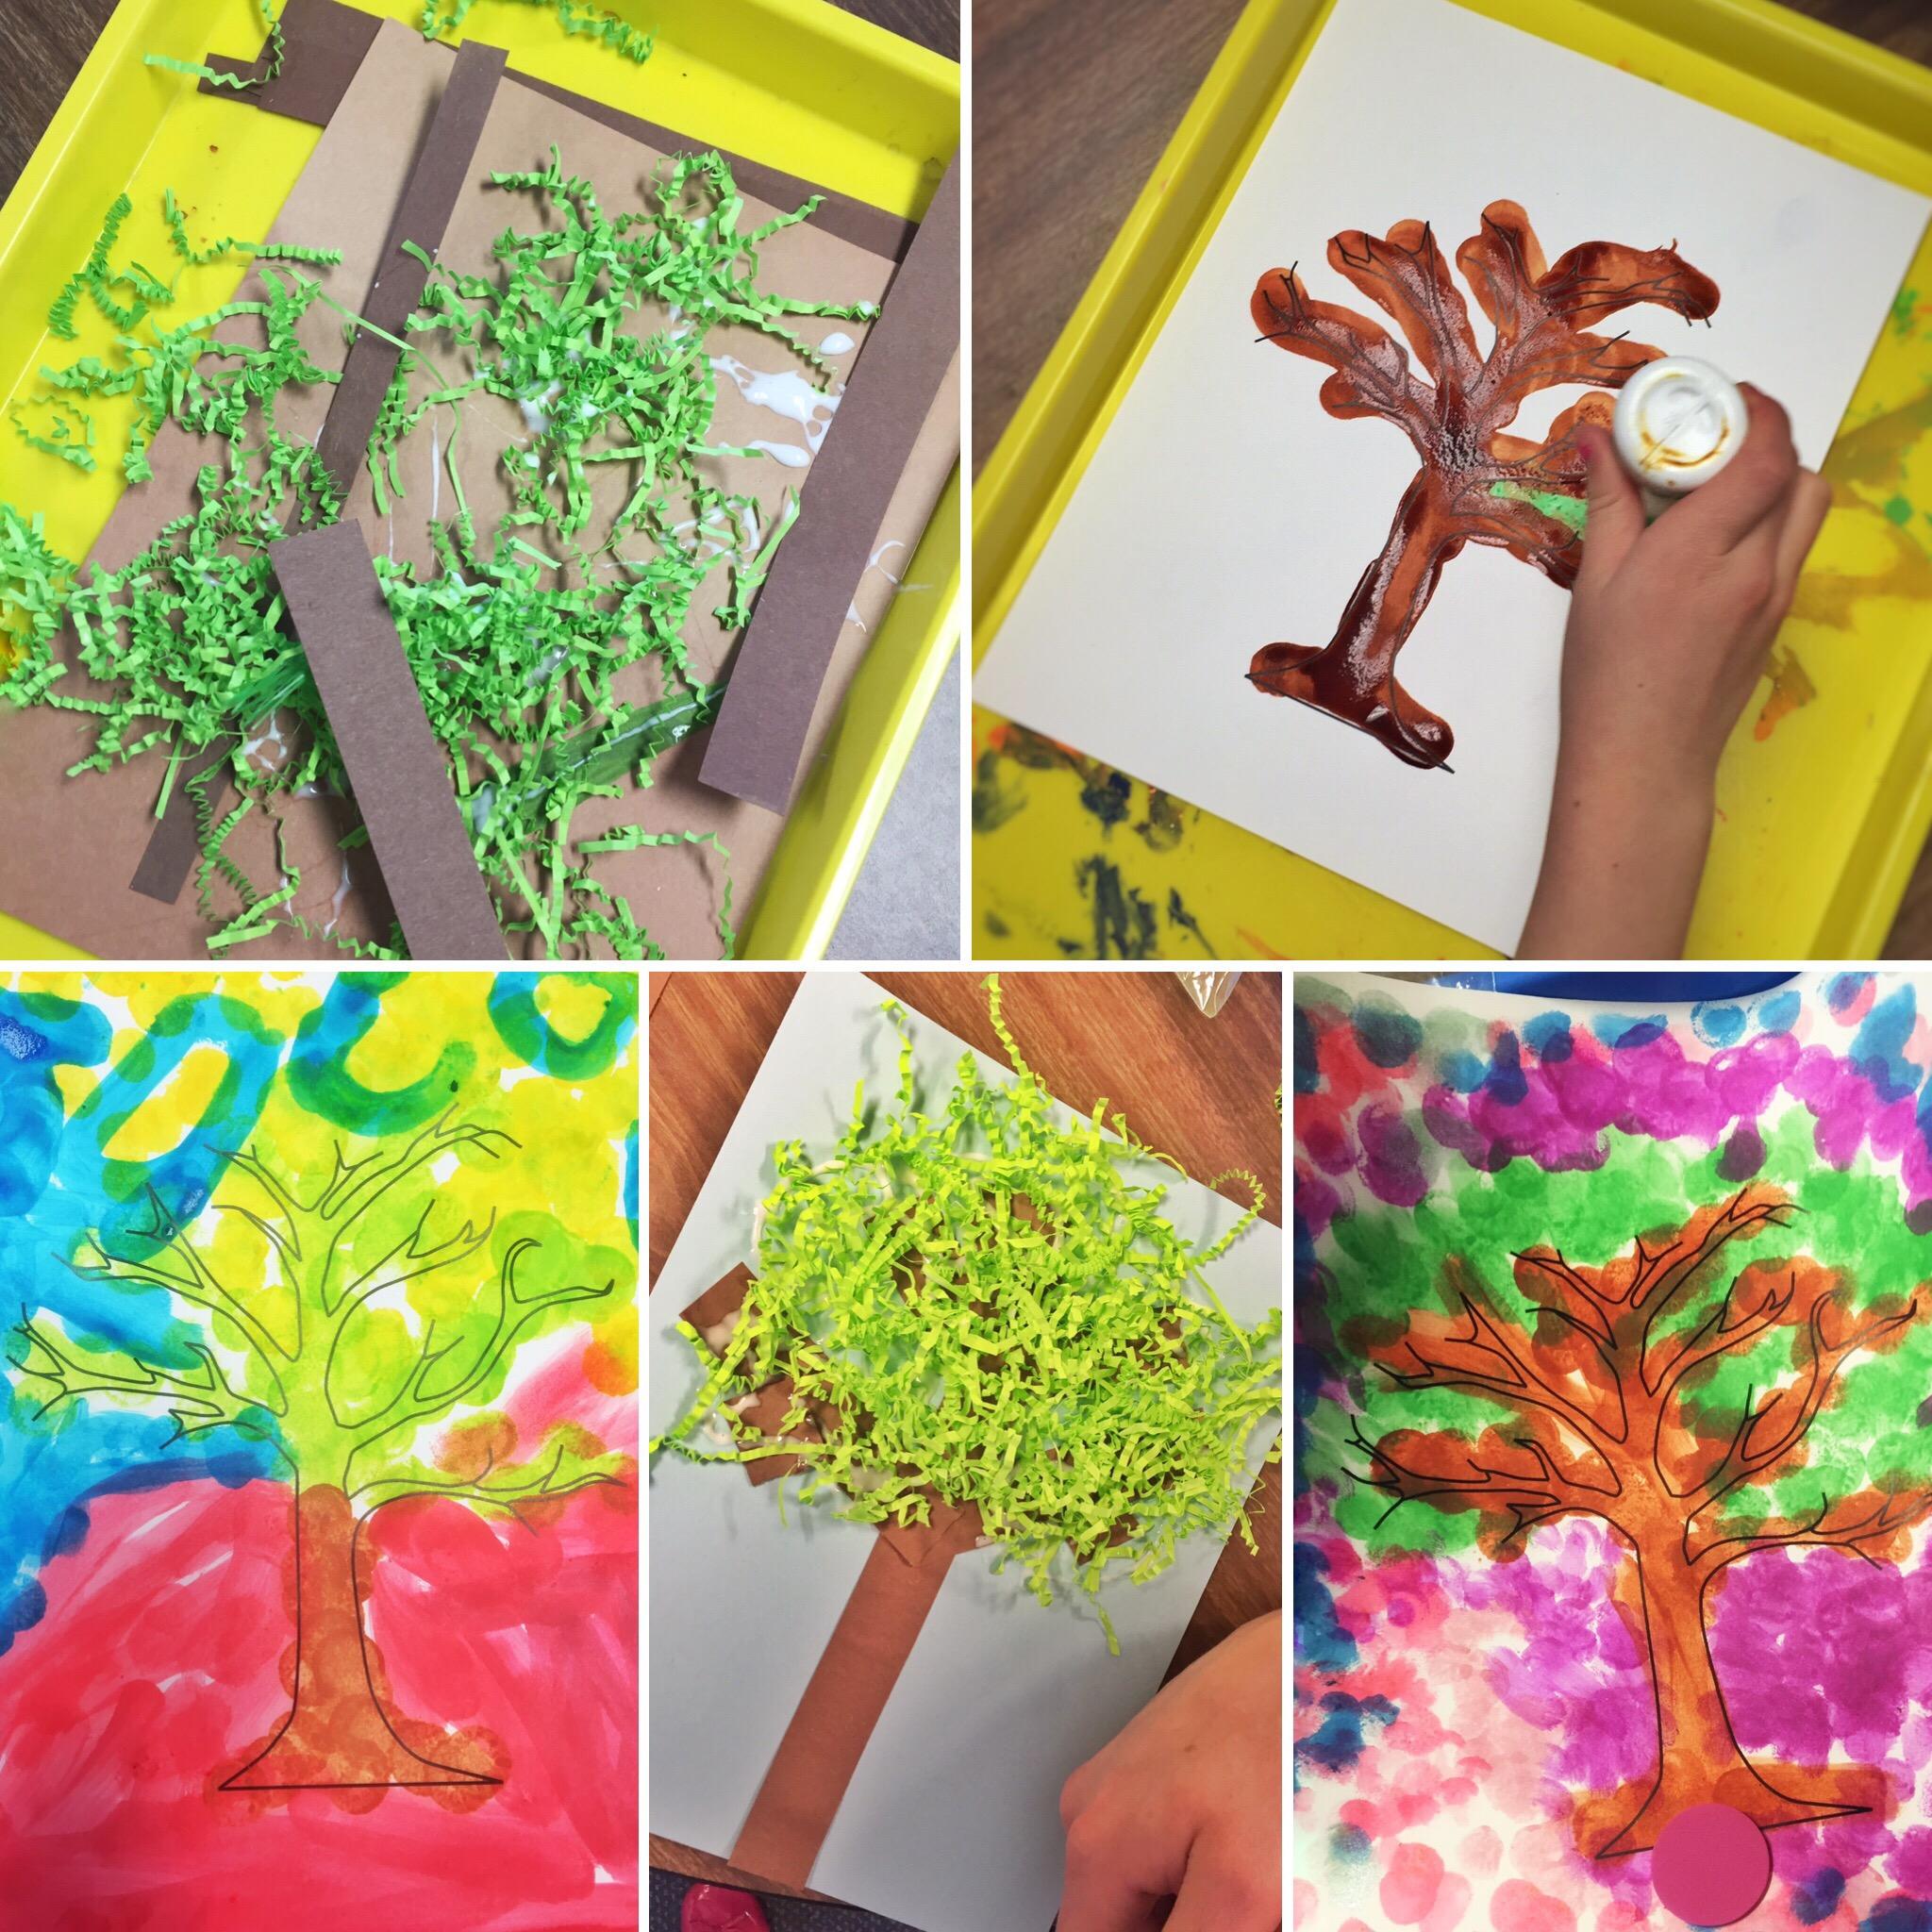 sycamore tree preschool jesus and zacchaeus lesson ideas grace and wondering 441